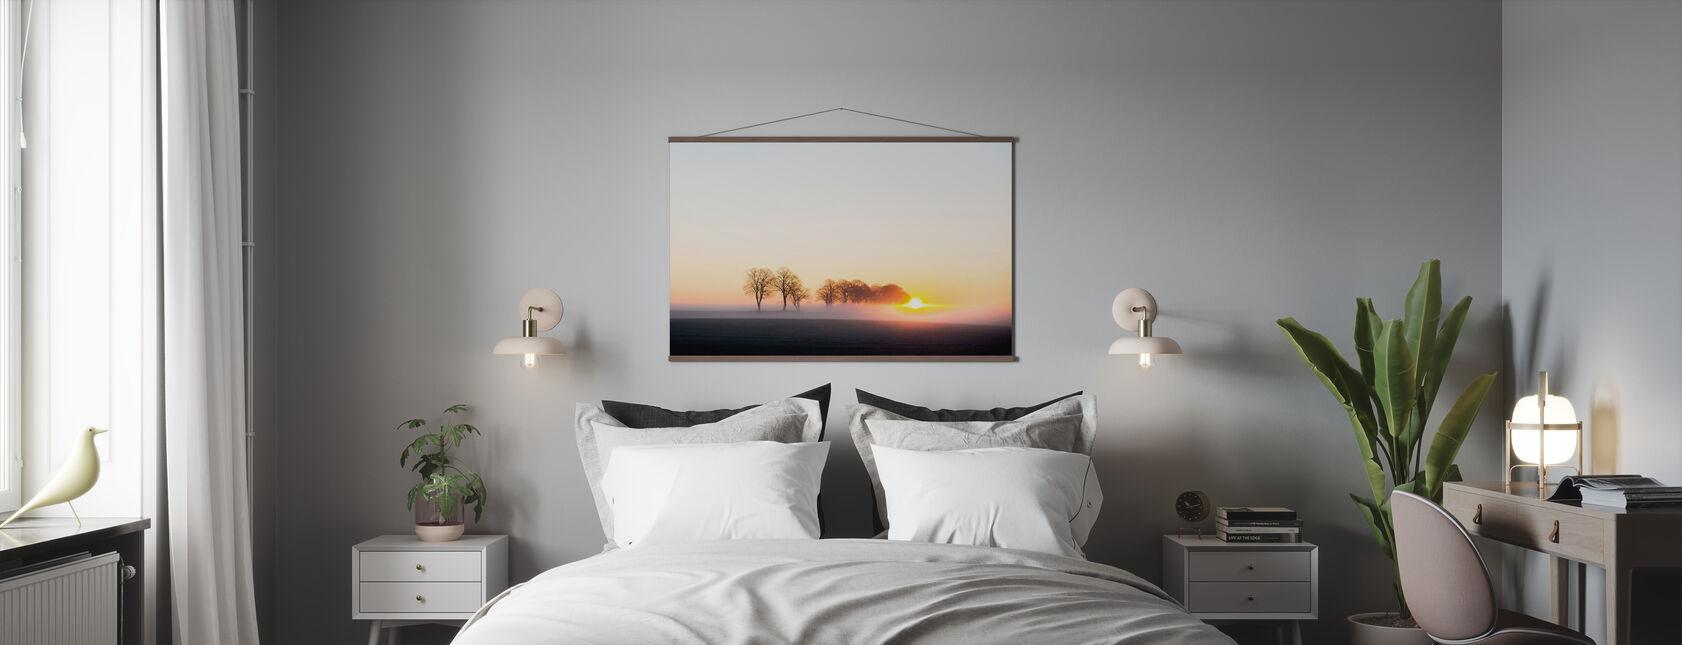 Waking up in Sweden - Poster - Bedroom